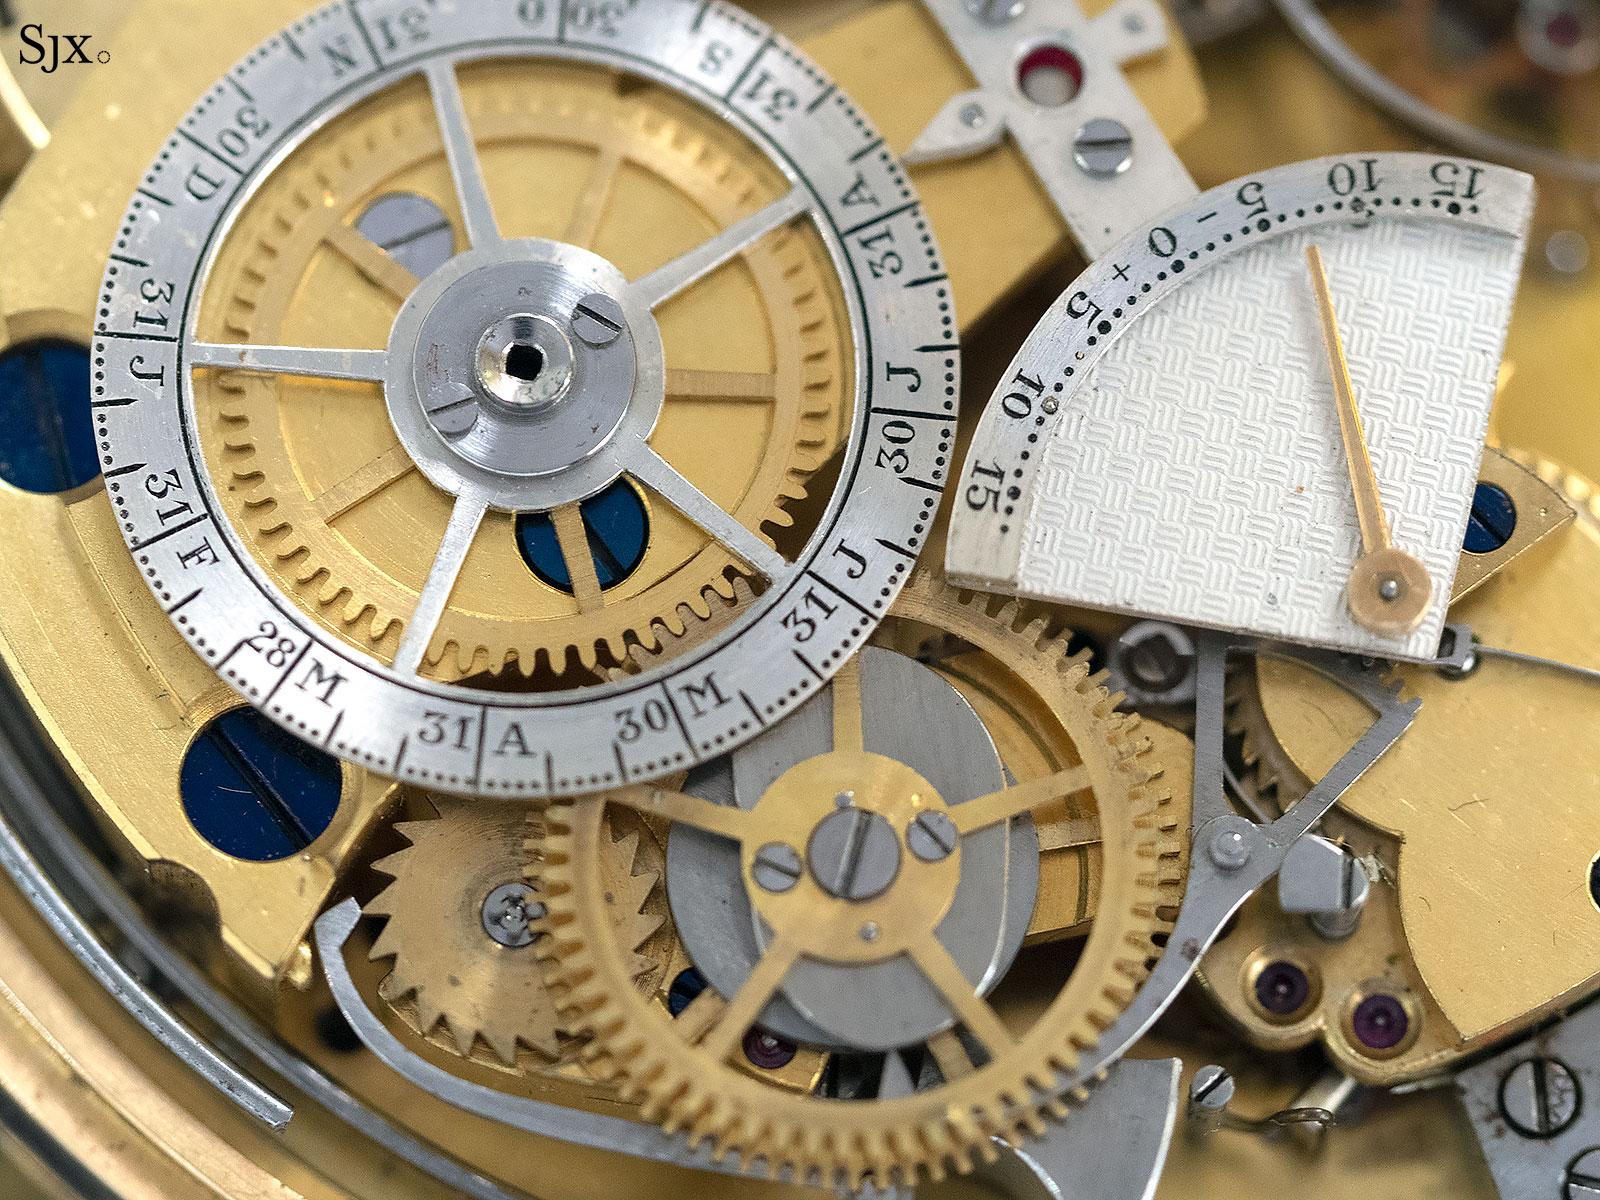 George Daniels Grand Complication pocket watch 19